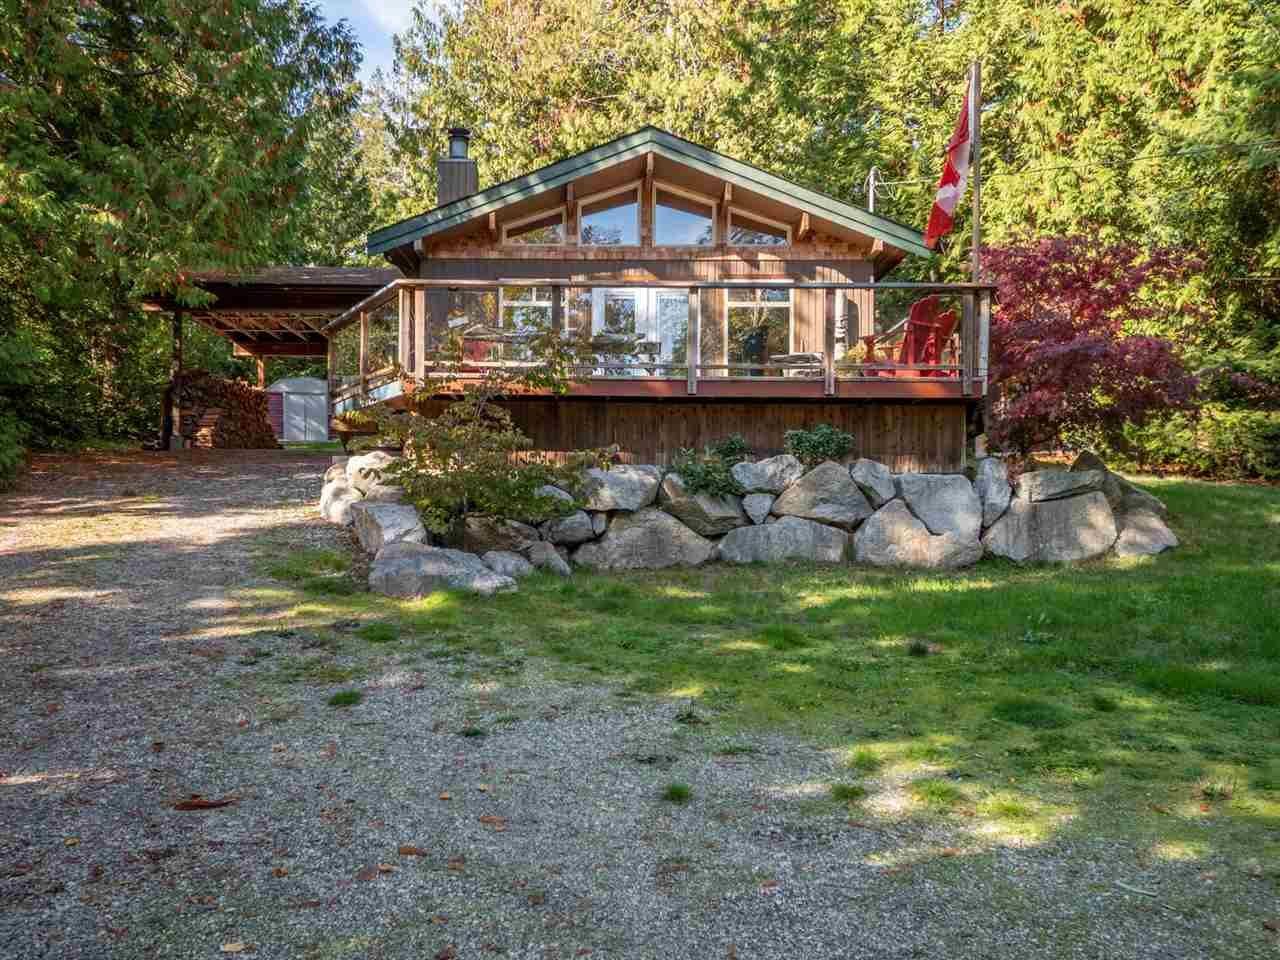 Main Photo: 5485 WAKEFIELD Road in Sechelt: Sechelt District House for sale (Sunshine Coast)  : MLS®# R2314066